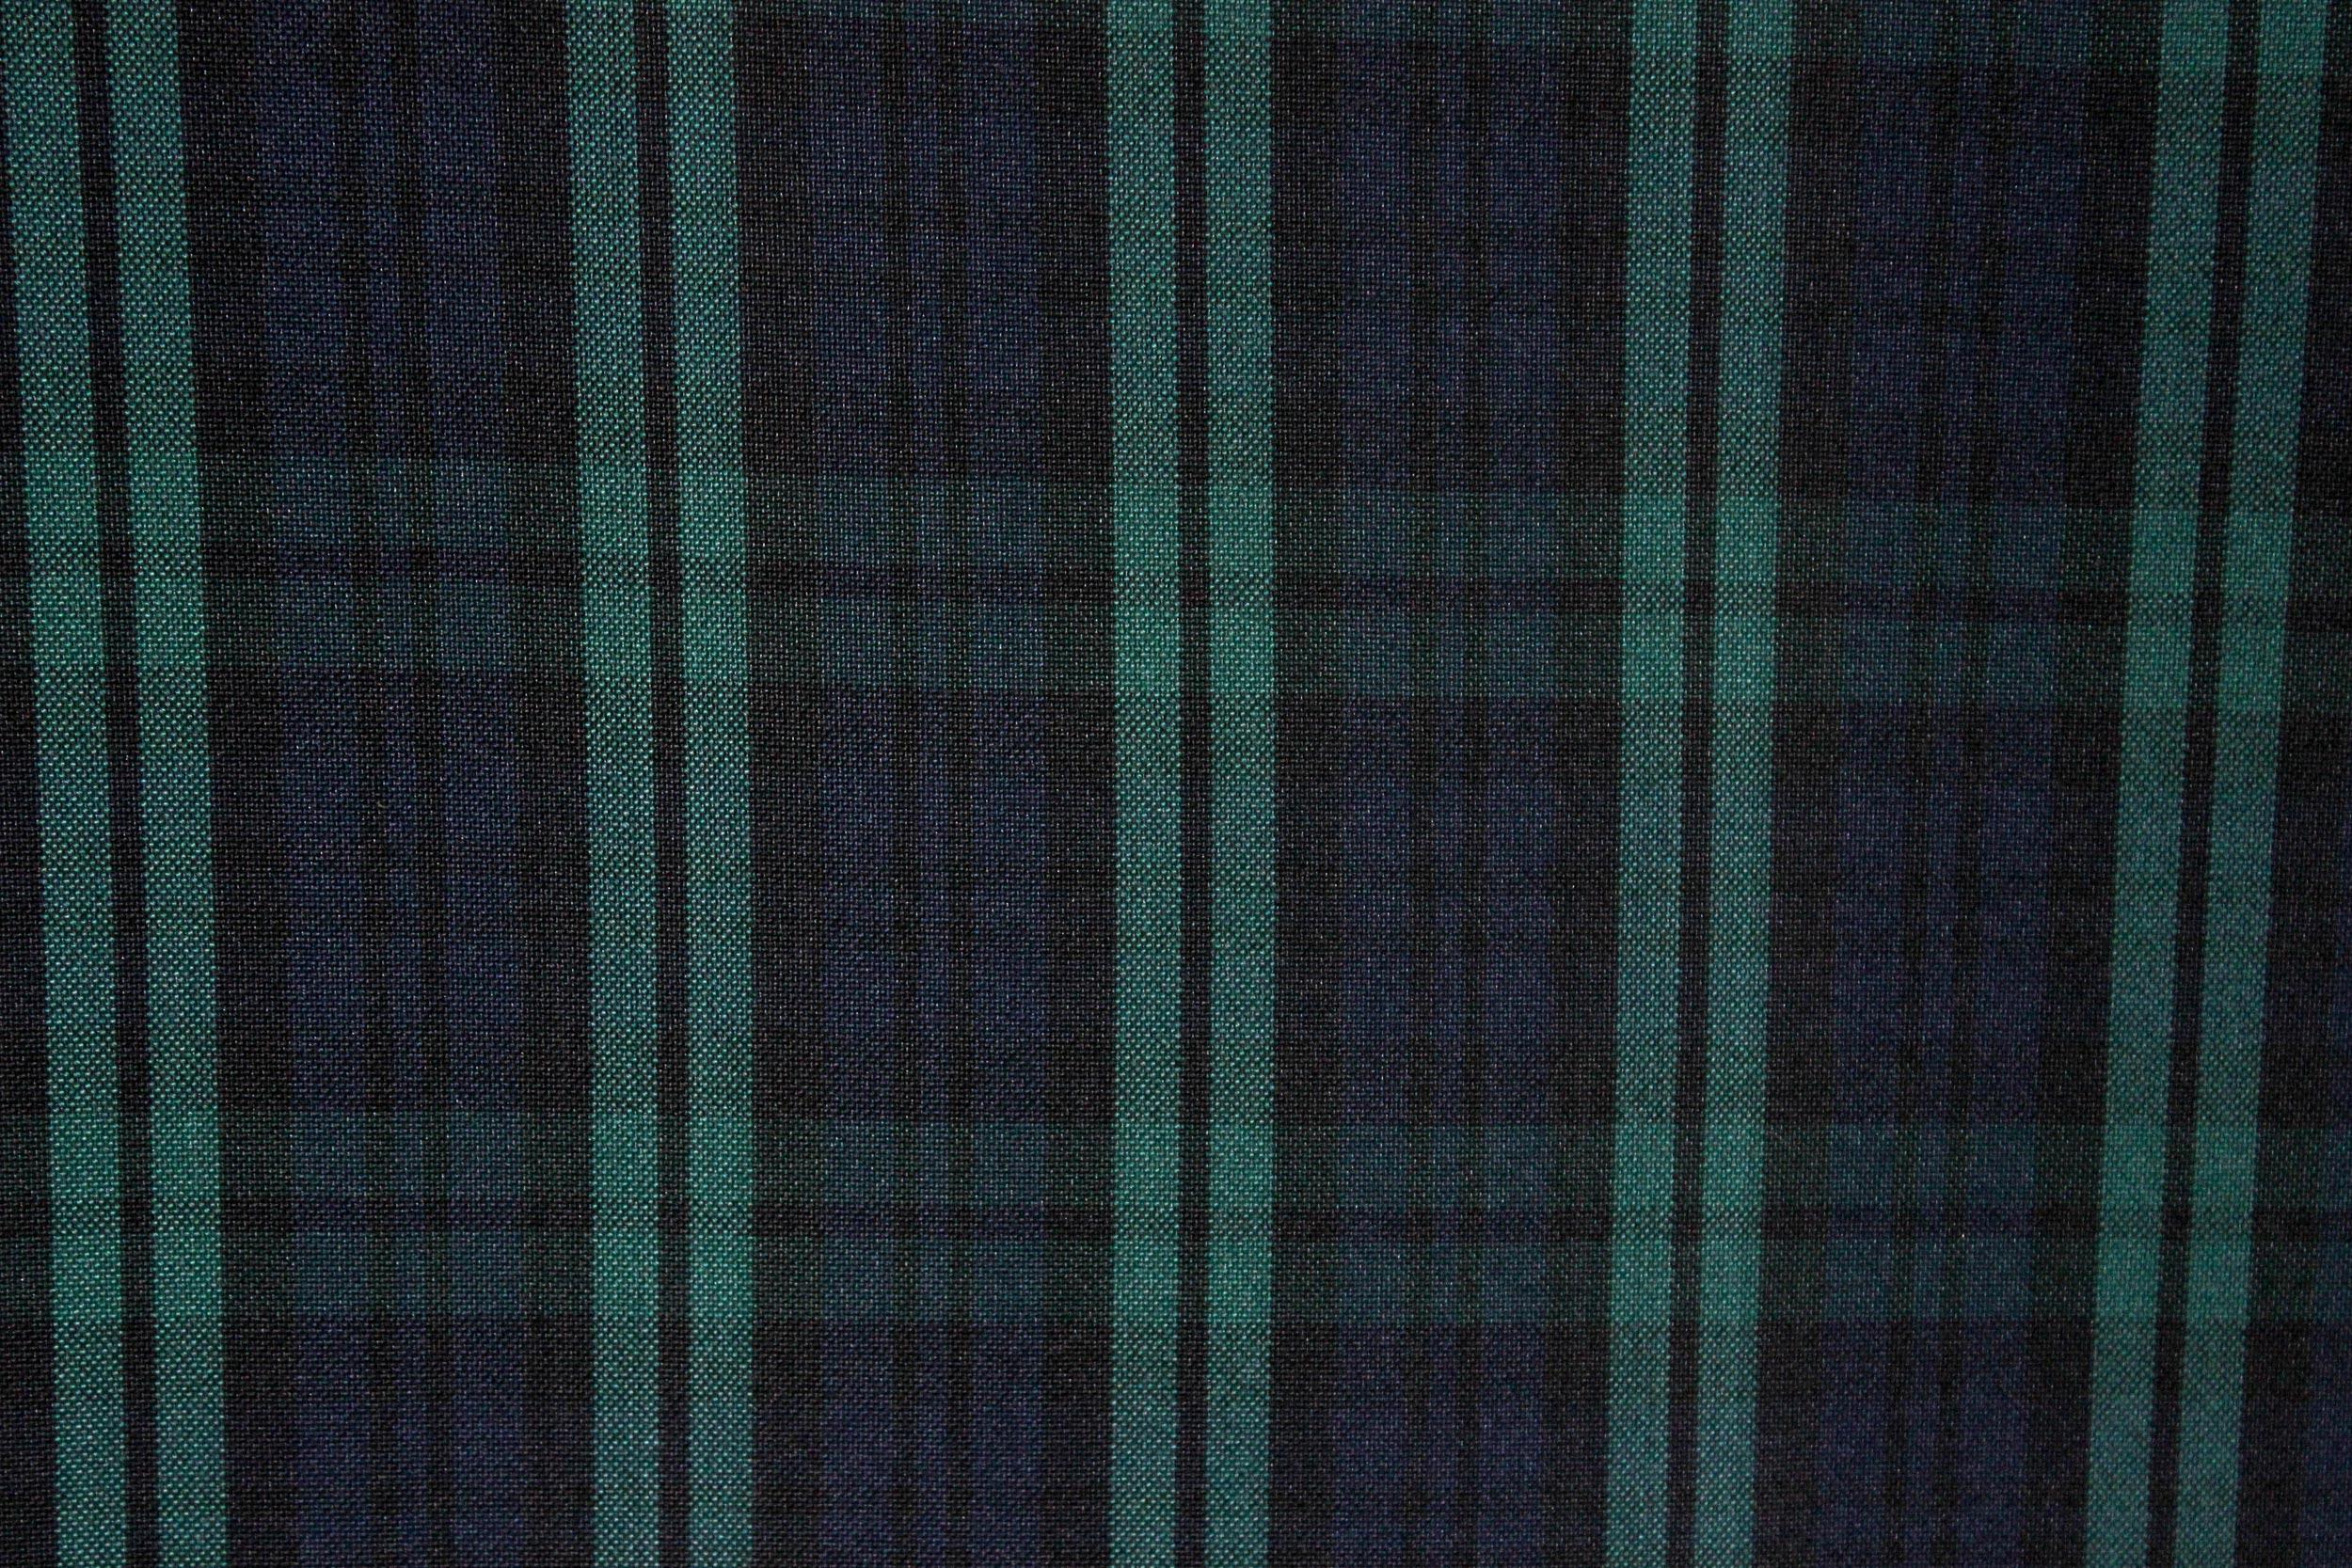 Tartan Plaid PP-79 Black Watch Drapery -The Fabric Mill